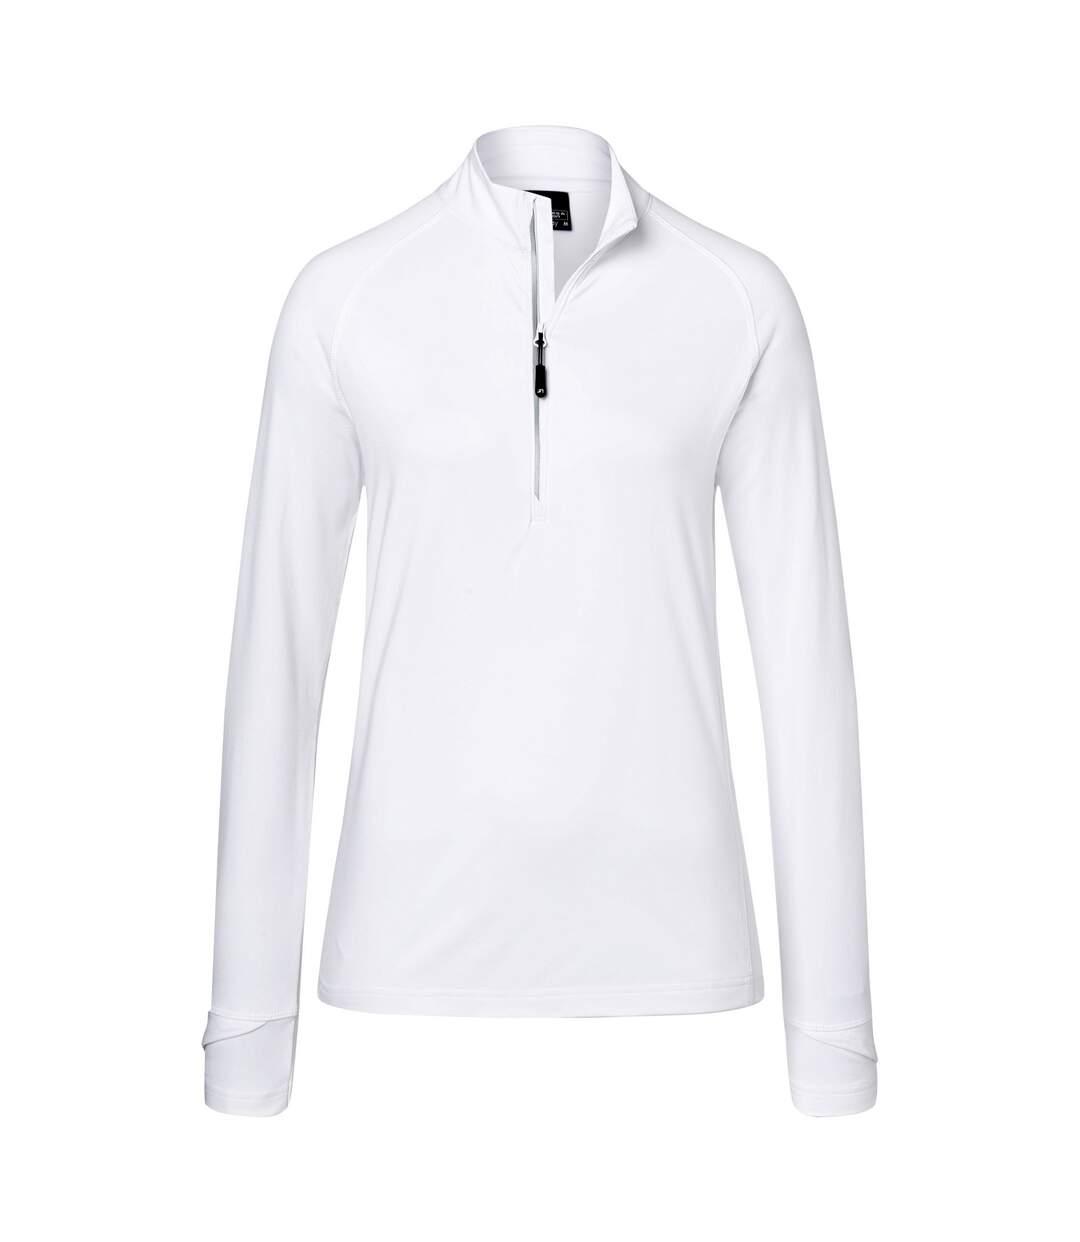 James And Nicholson - T-Shirt Zippé - Femme (Blanc) - UTFU942